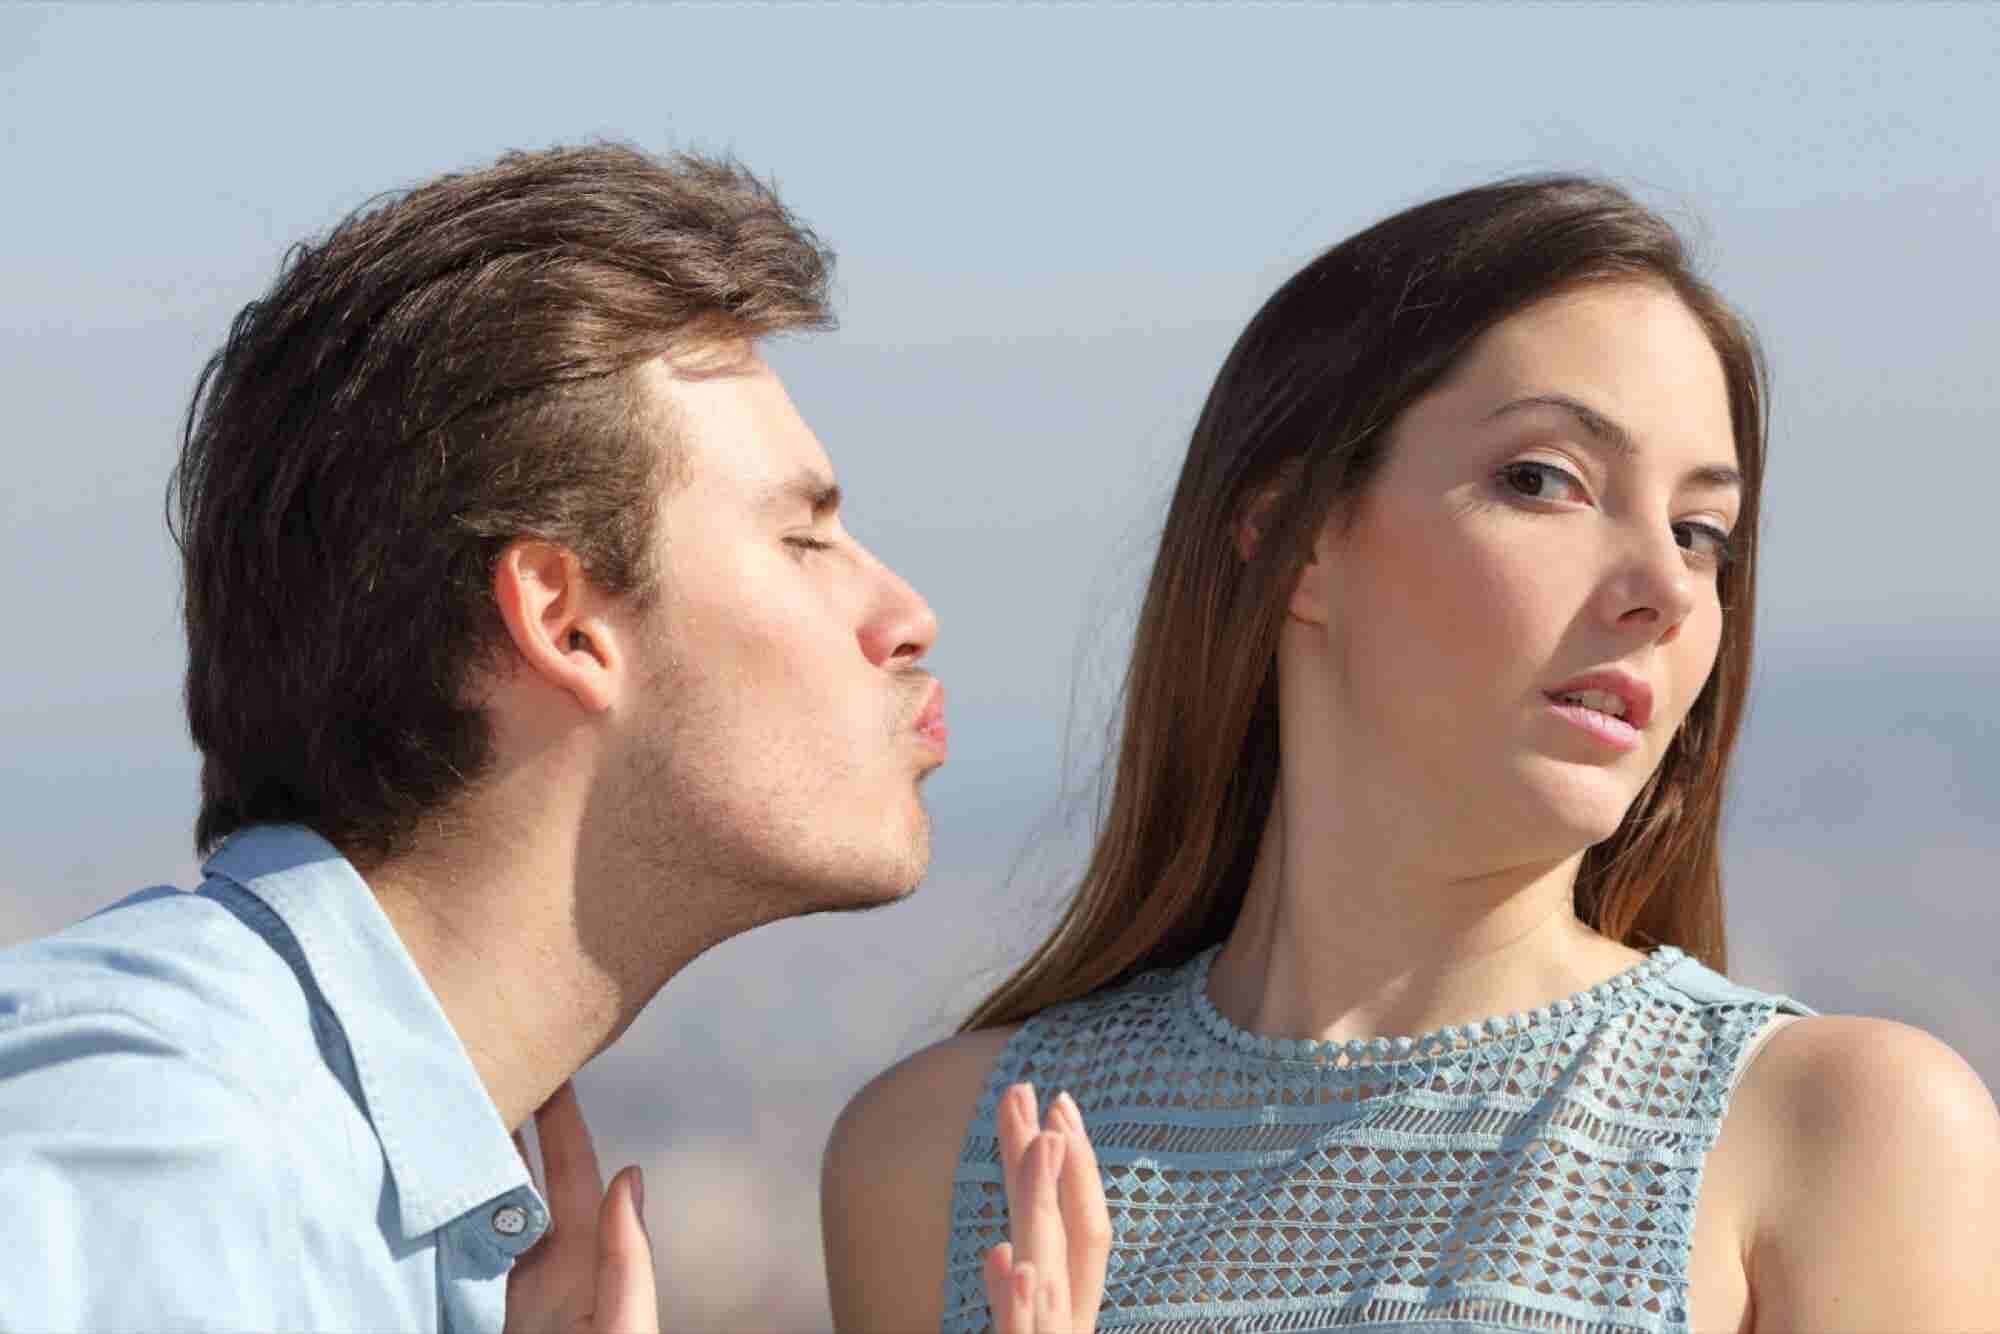 Stock Market Status Won't Buy an Entrepreneur Love